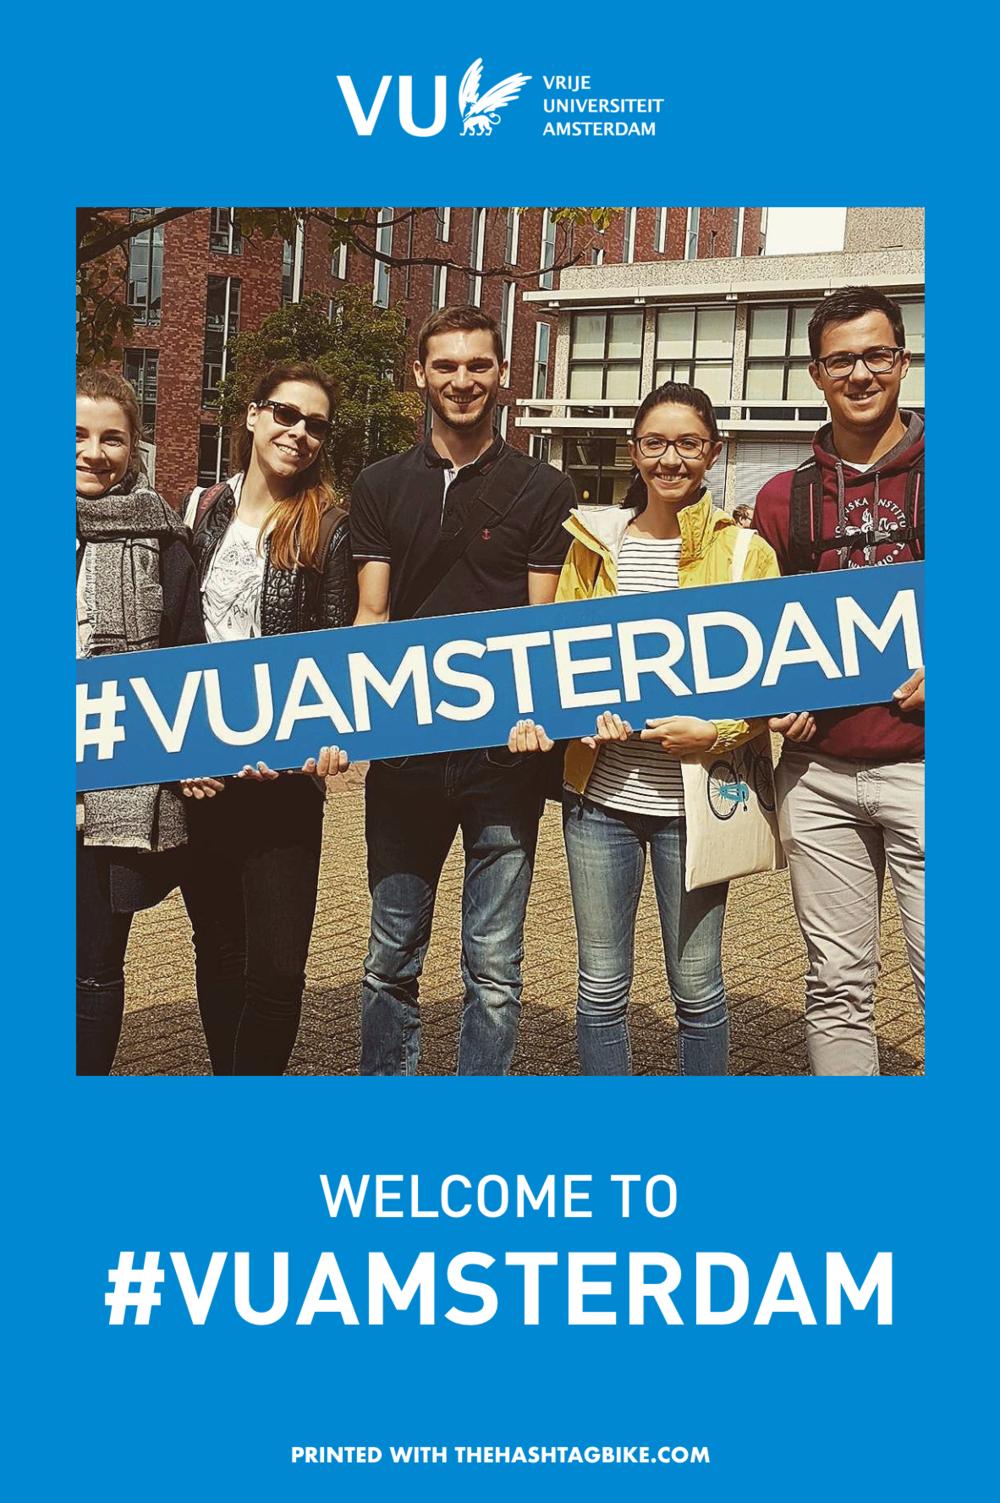 vuamsterdam_thehashtagbike4.png